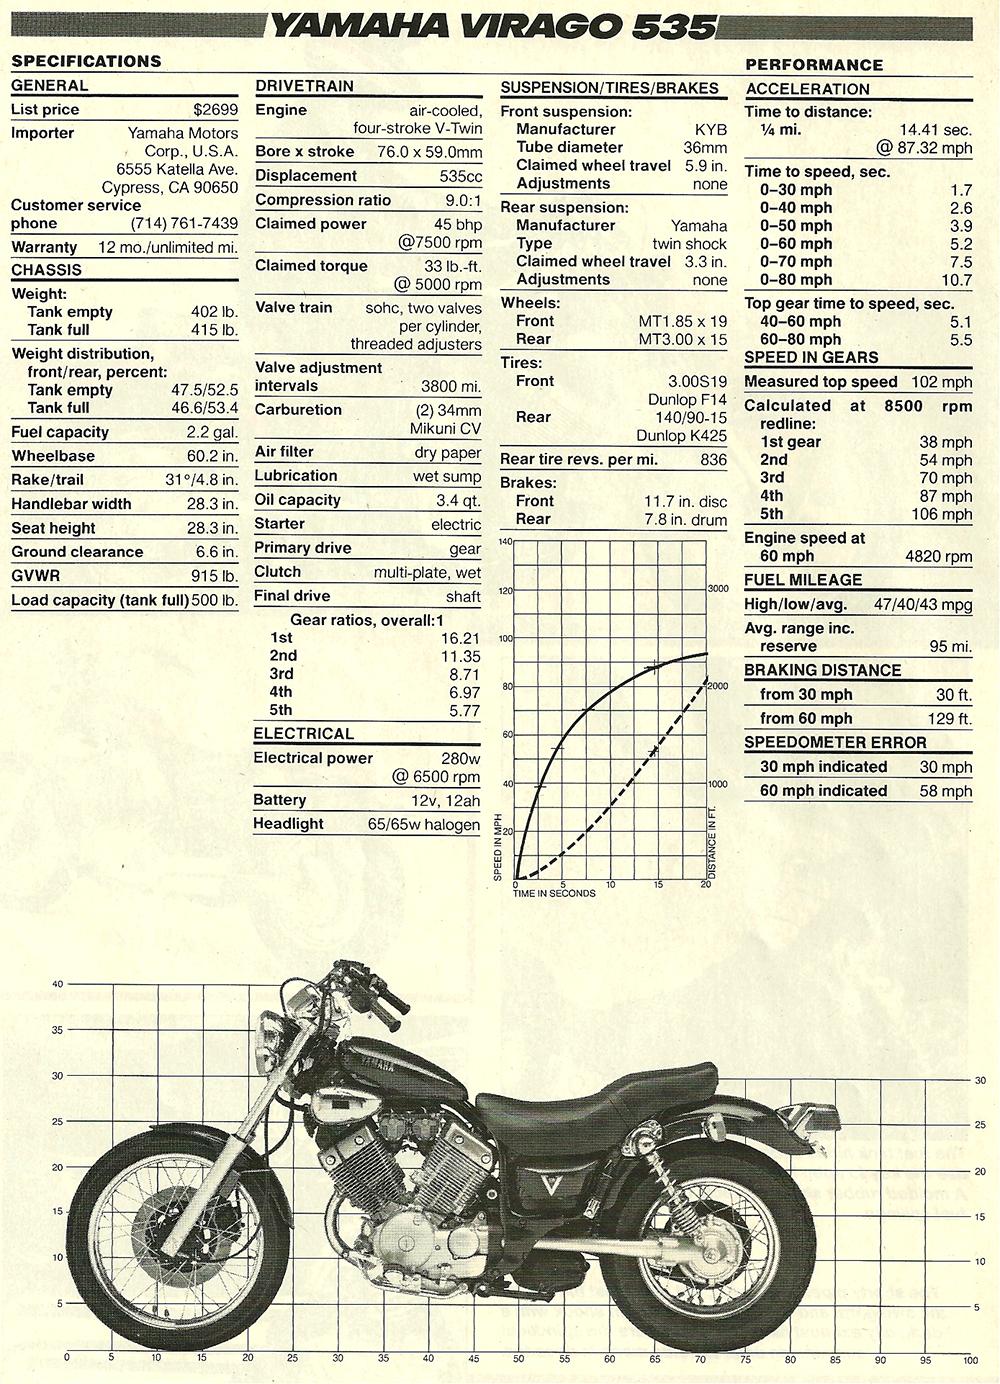 1987 Yamaha Virago 535 road test 05.jpg